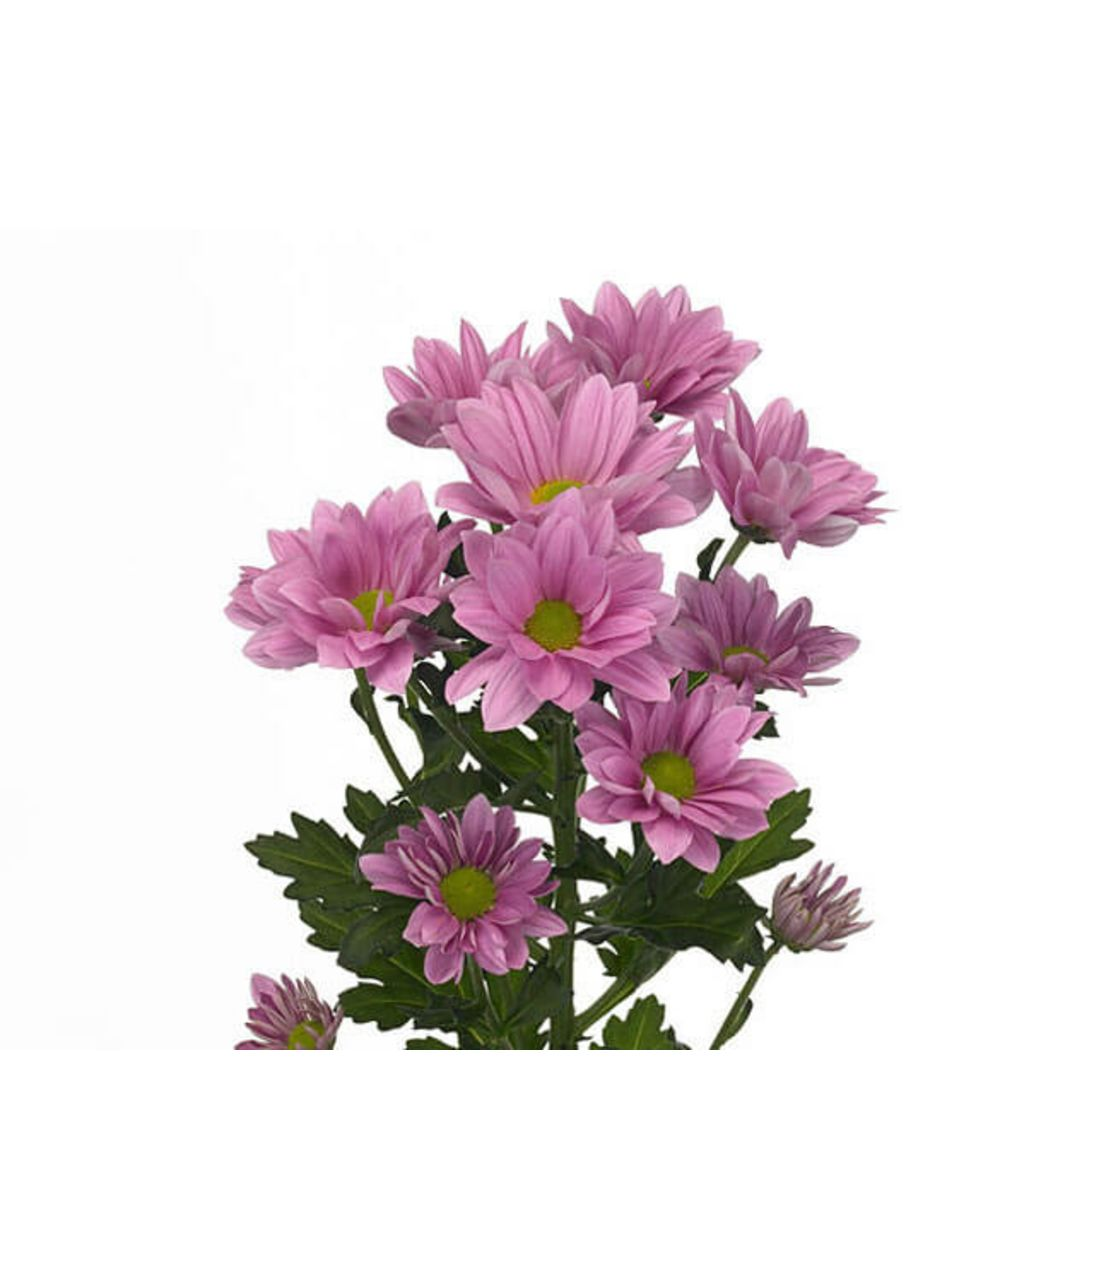 Хризантема розовая (ветка). Superflowers.com.ua